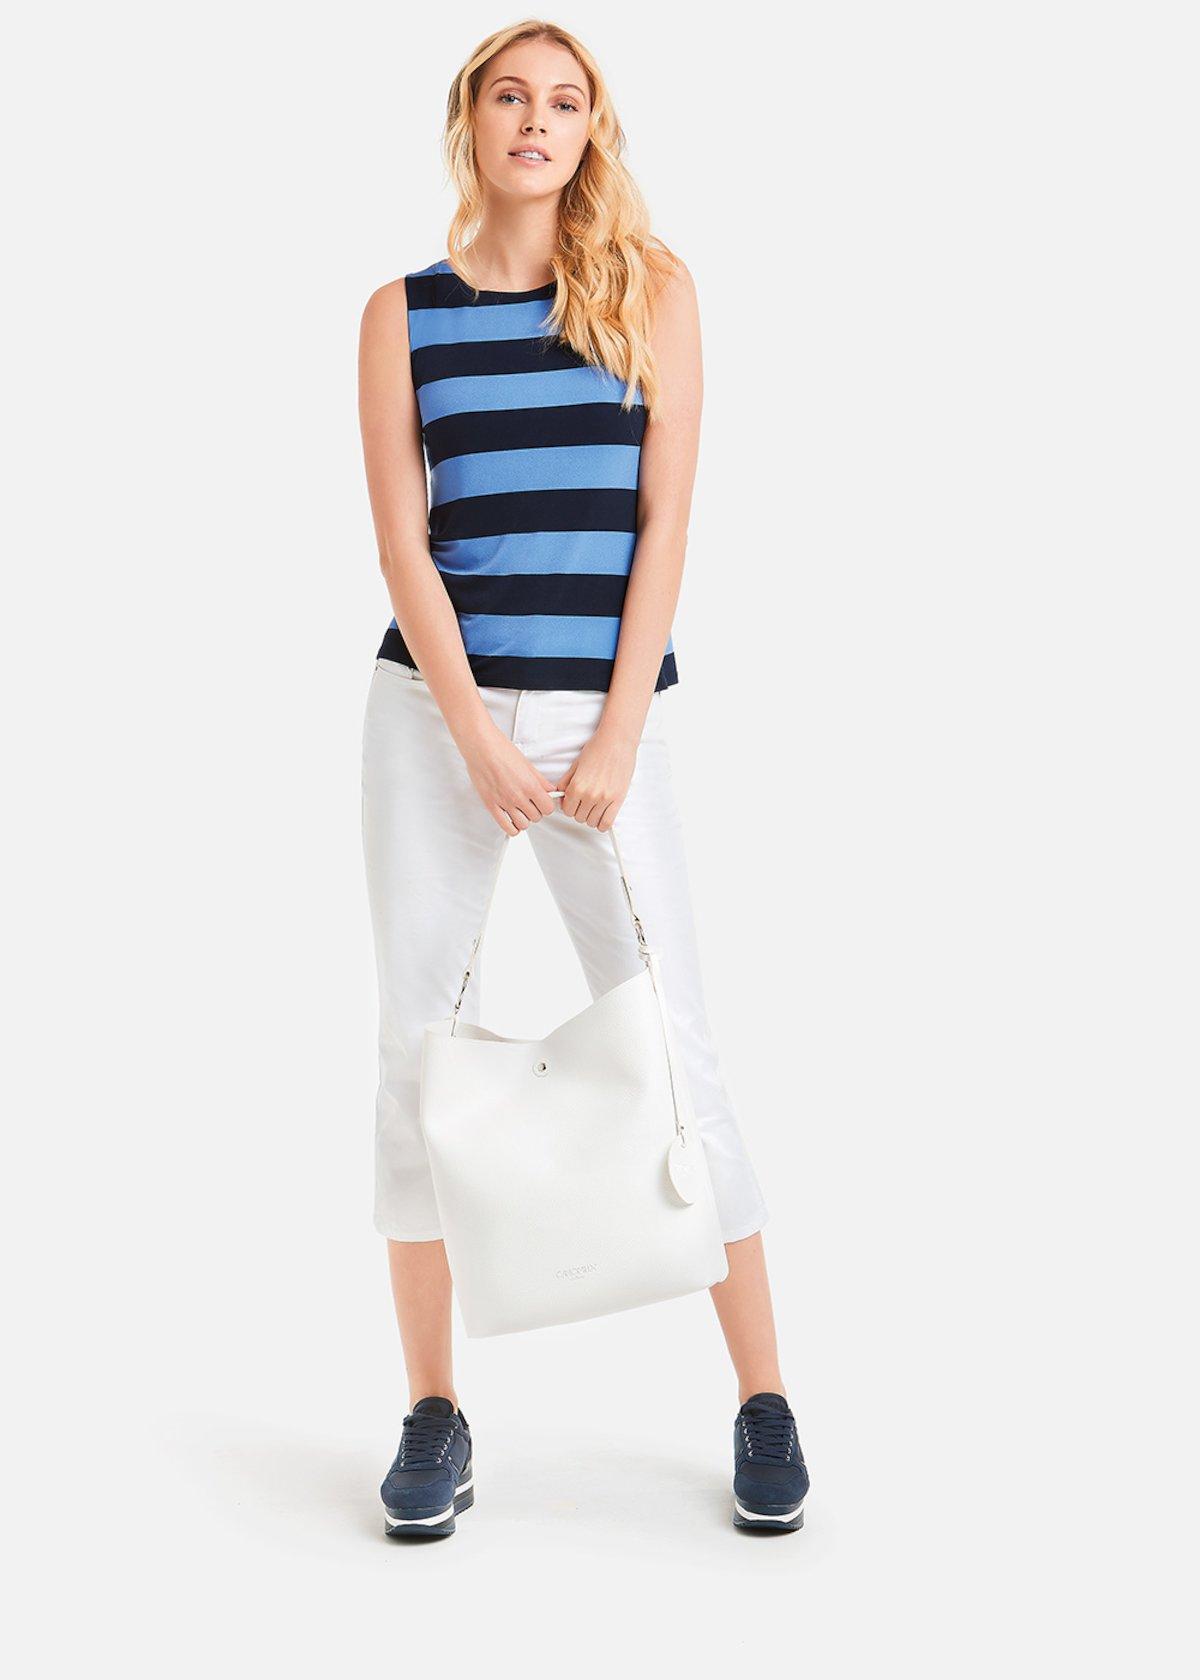 Tailor Top stripe pattern - Medium Blue / Divino Stripes